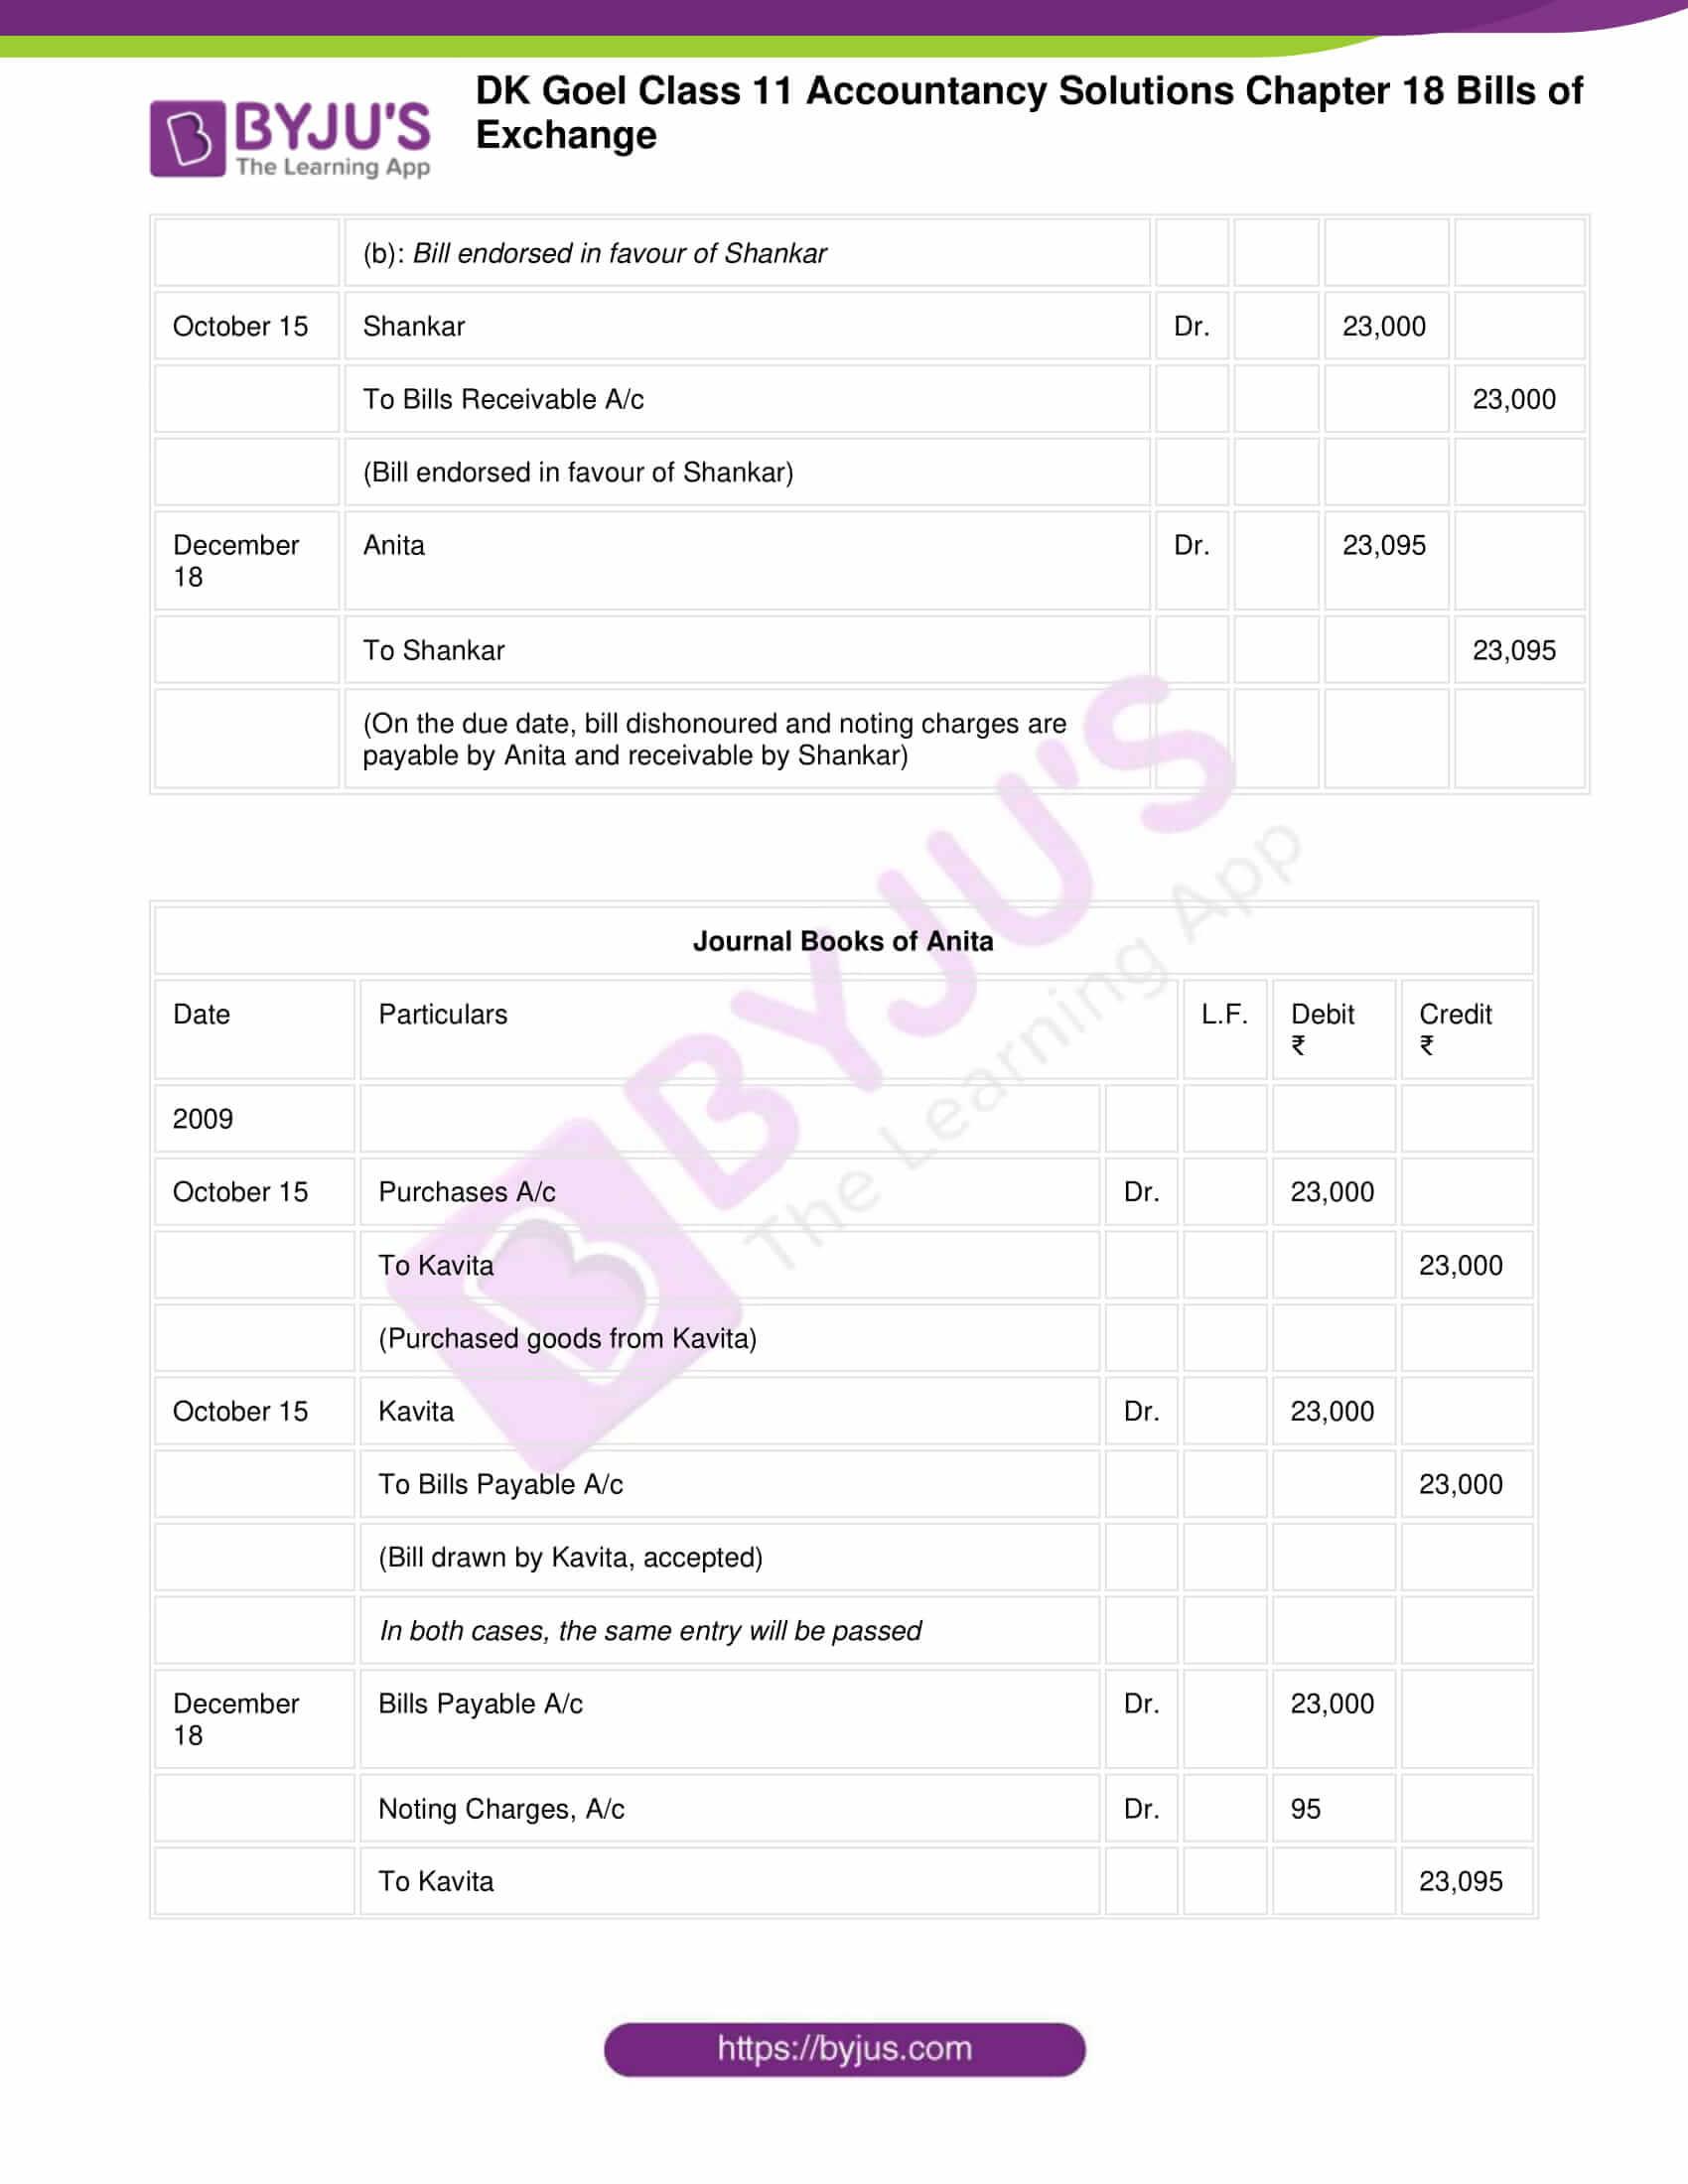 dk goel class 11 accountancy solutions chapter 18 089